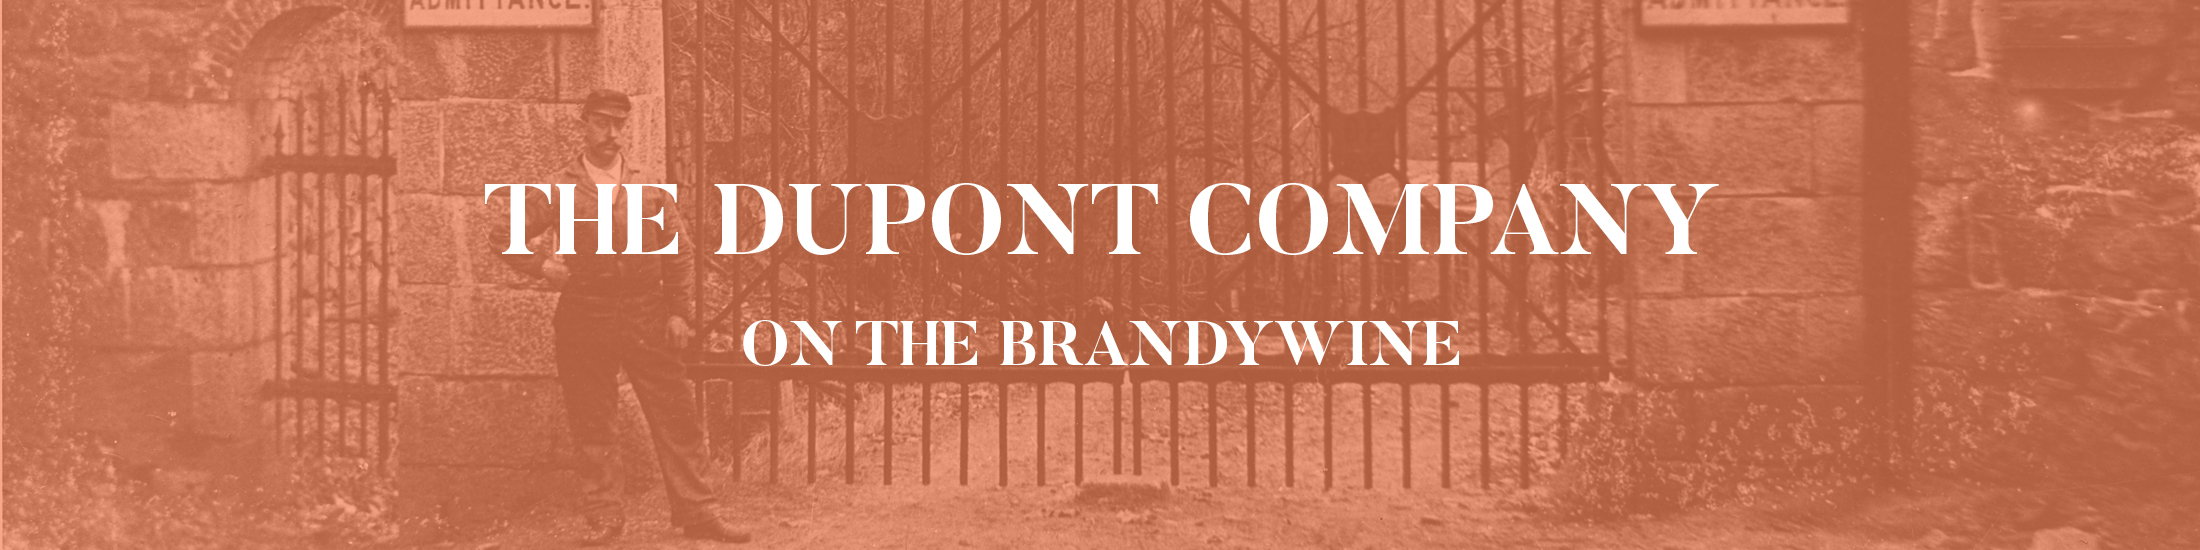 The Du Pont Company on the Brandywine